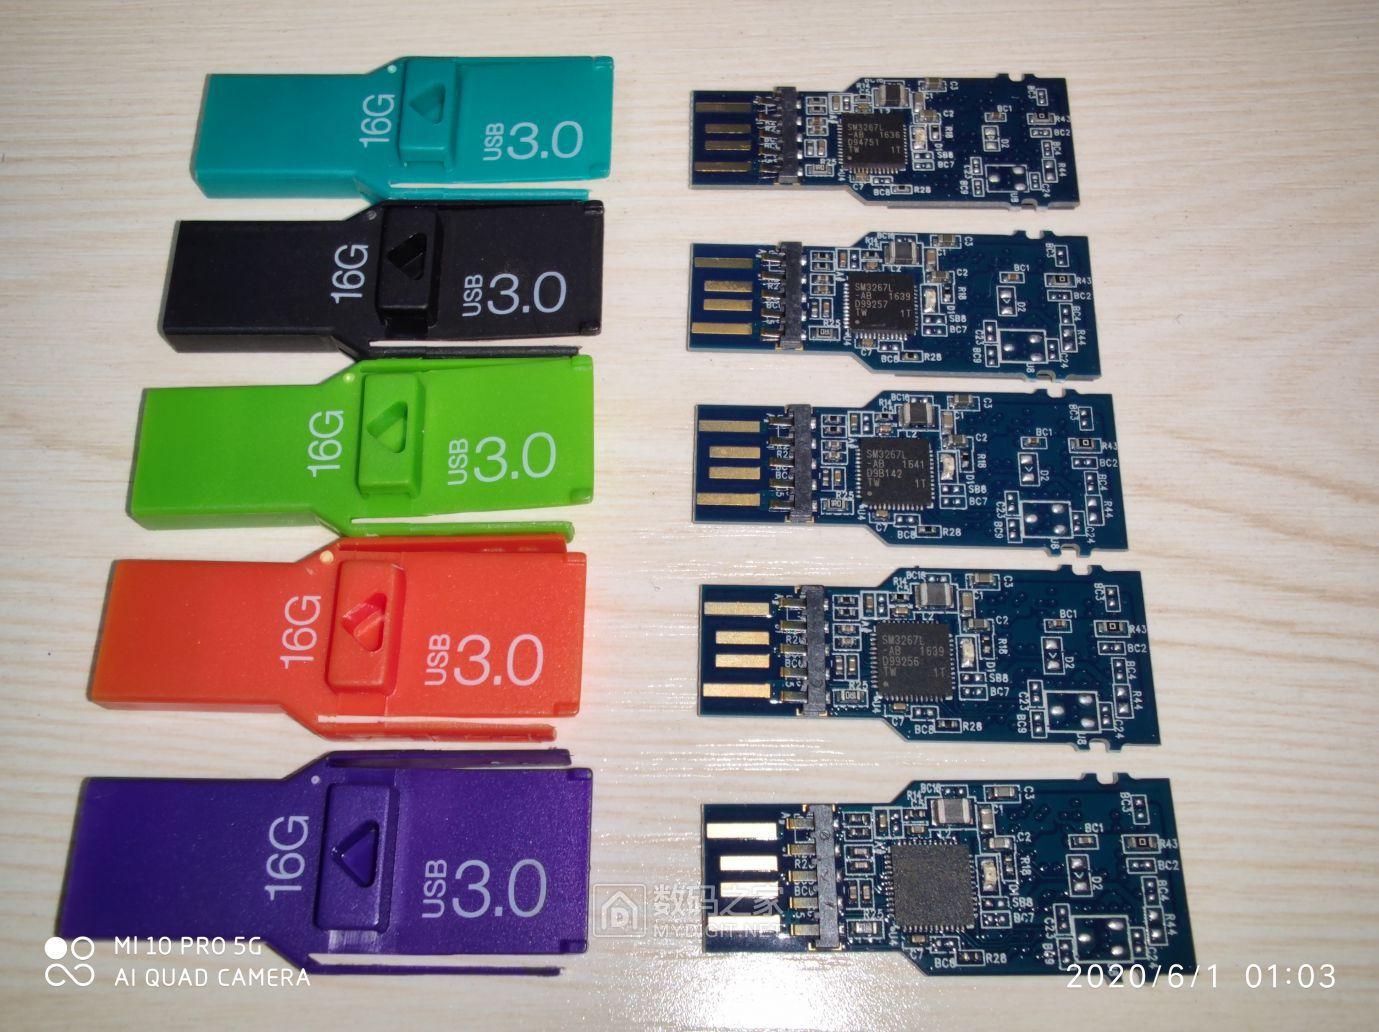 S25 16GB外壳及芯片板正面